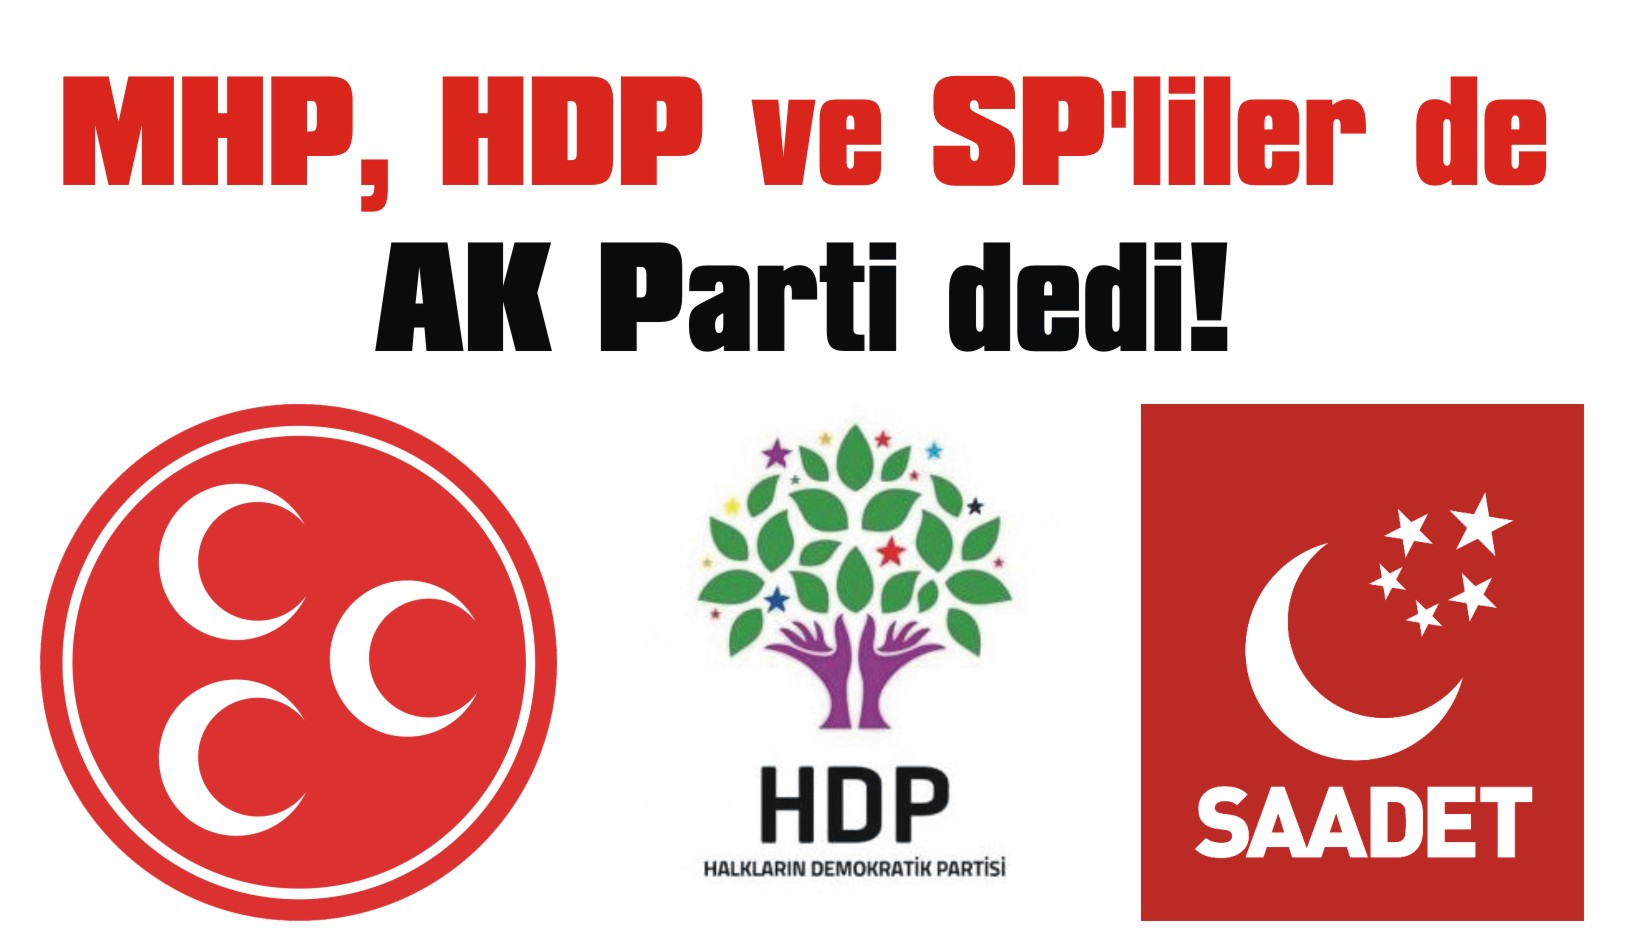 MHP, HDP ve SP'liler de AK Parti dedi!